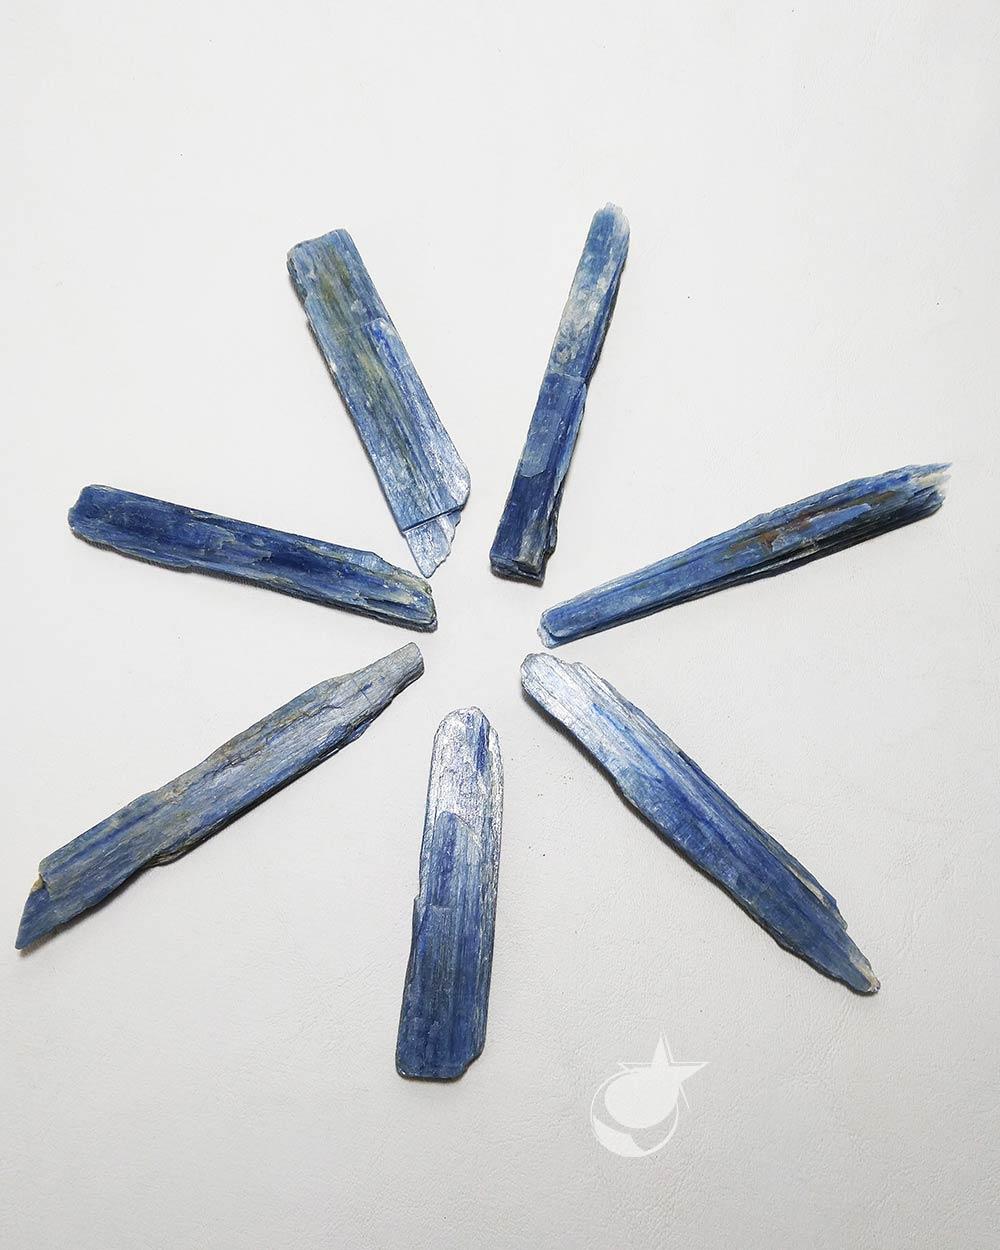 CIANITA AZUL  - UNIDADE - média de 8 a 10 cm (21 a 26g)